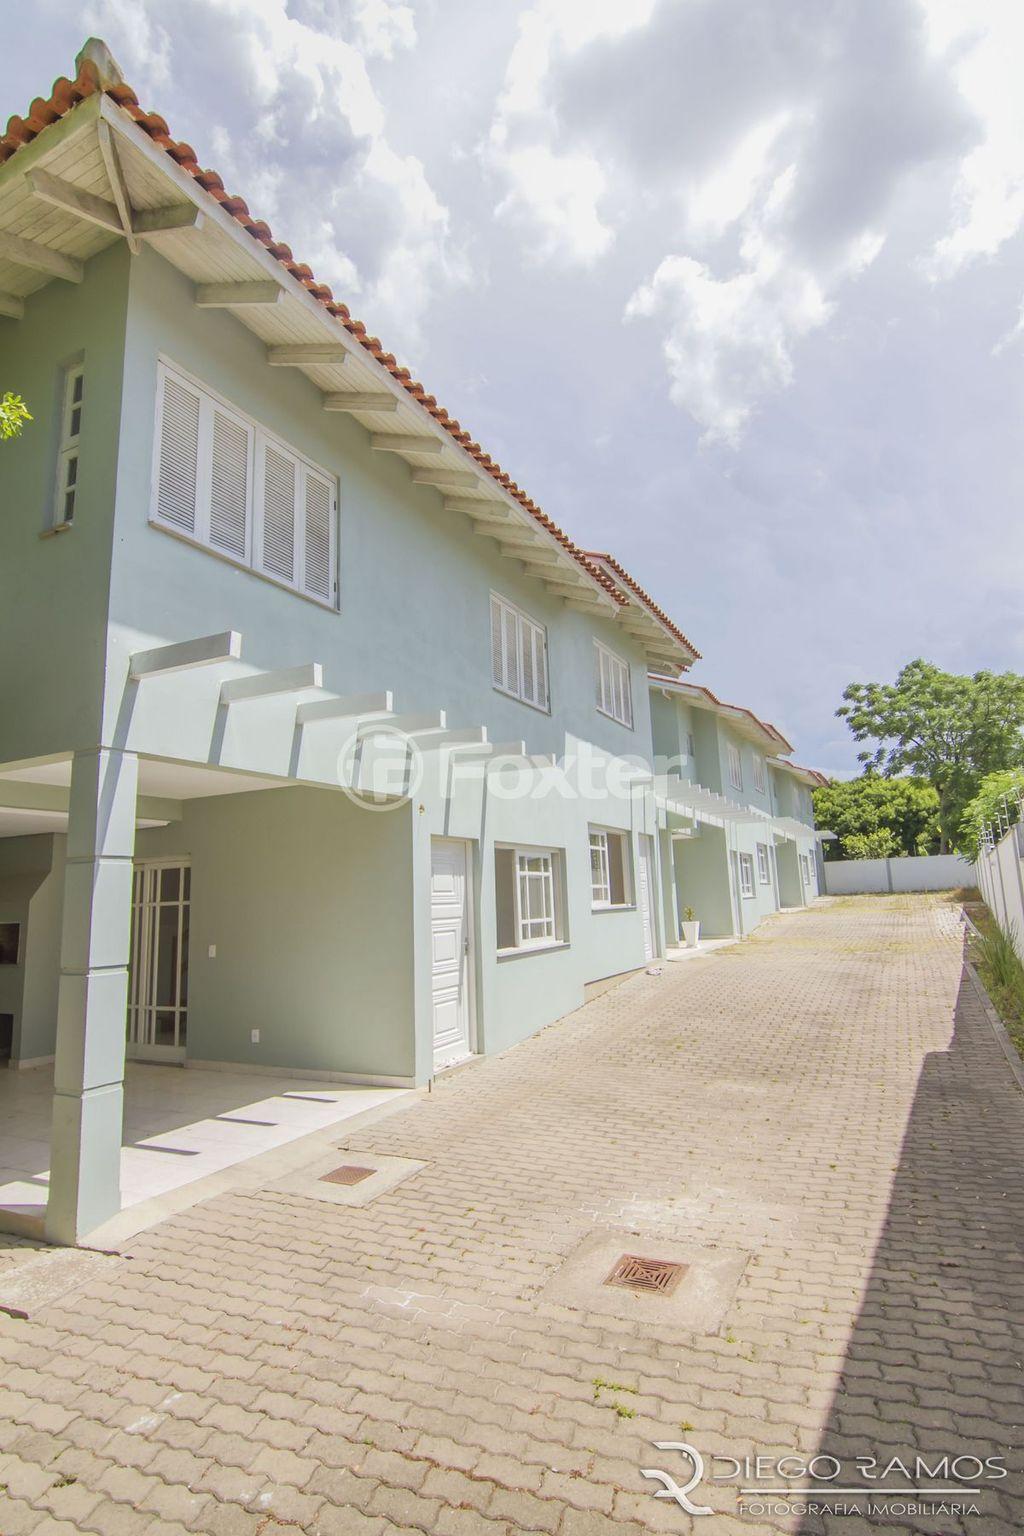 Casa 2 Dorm, Aberta dos Morros, Porto Alegre (118259) - Foto 2